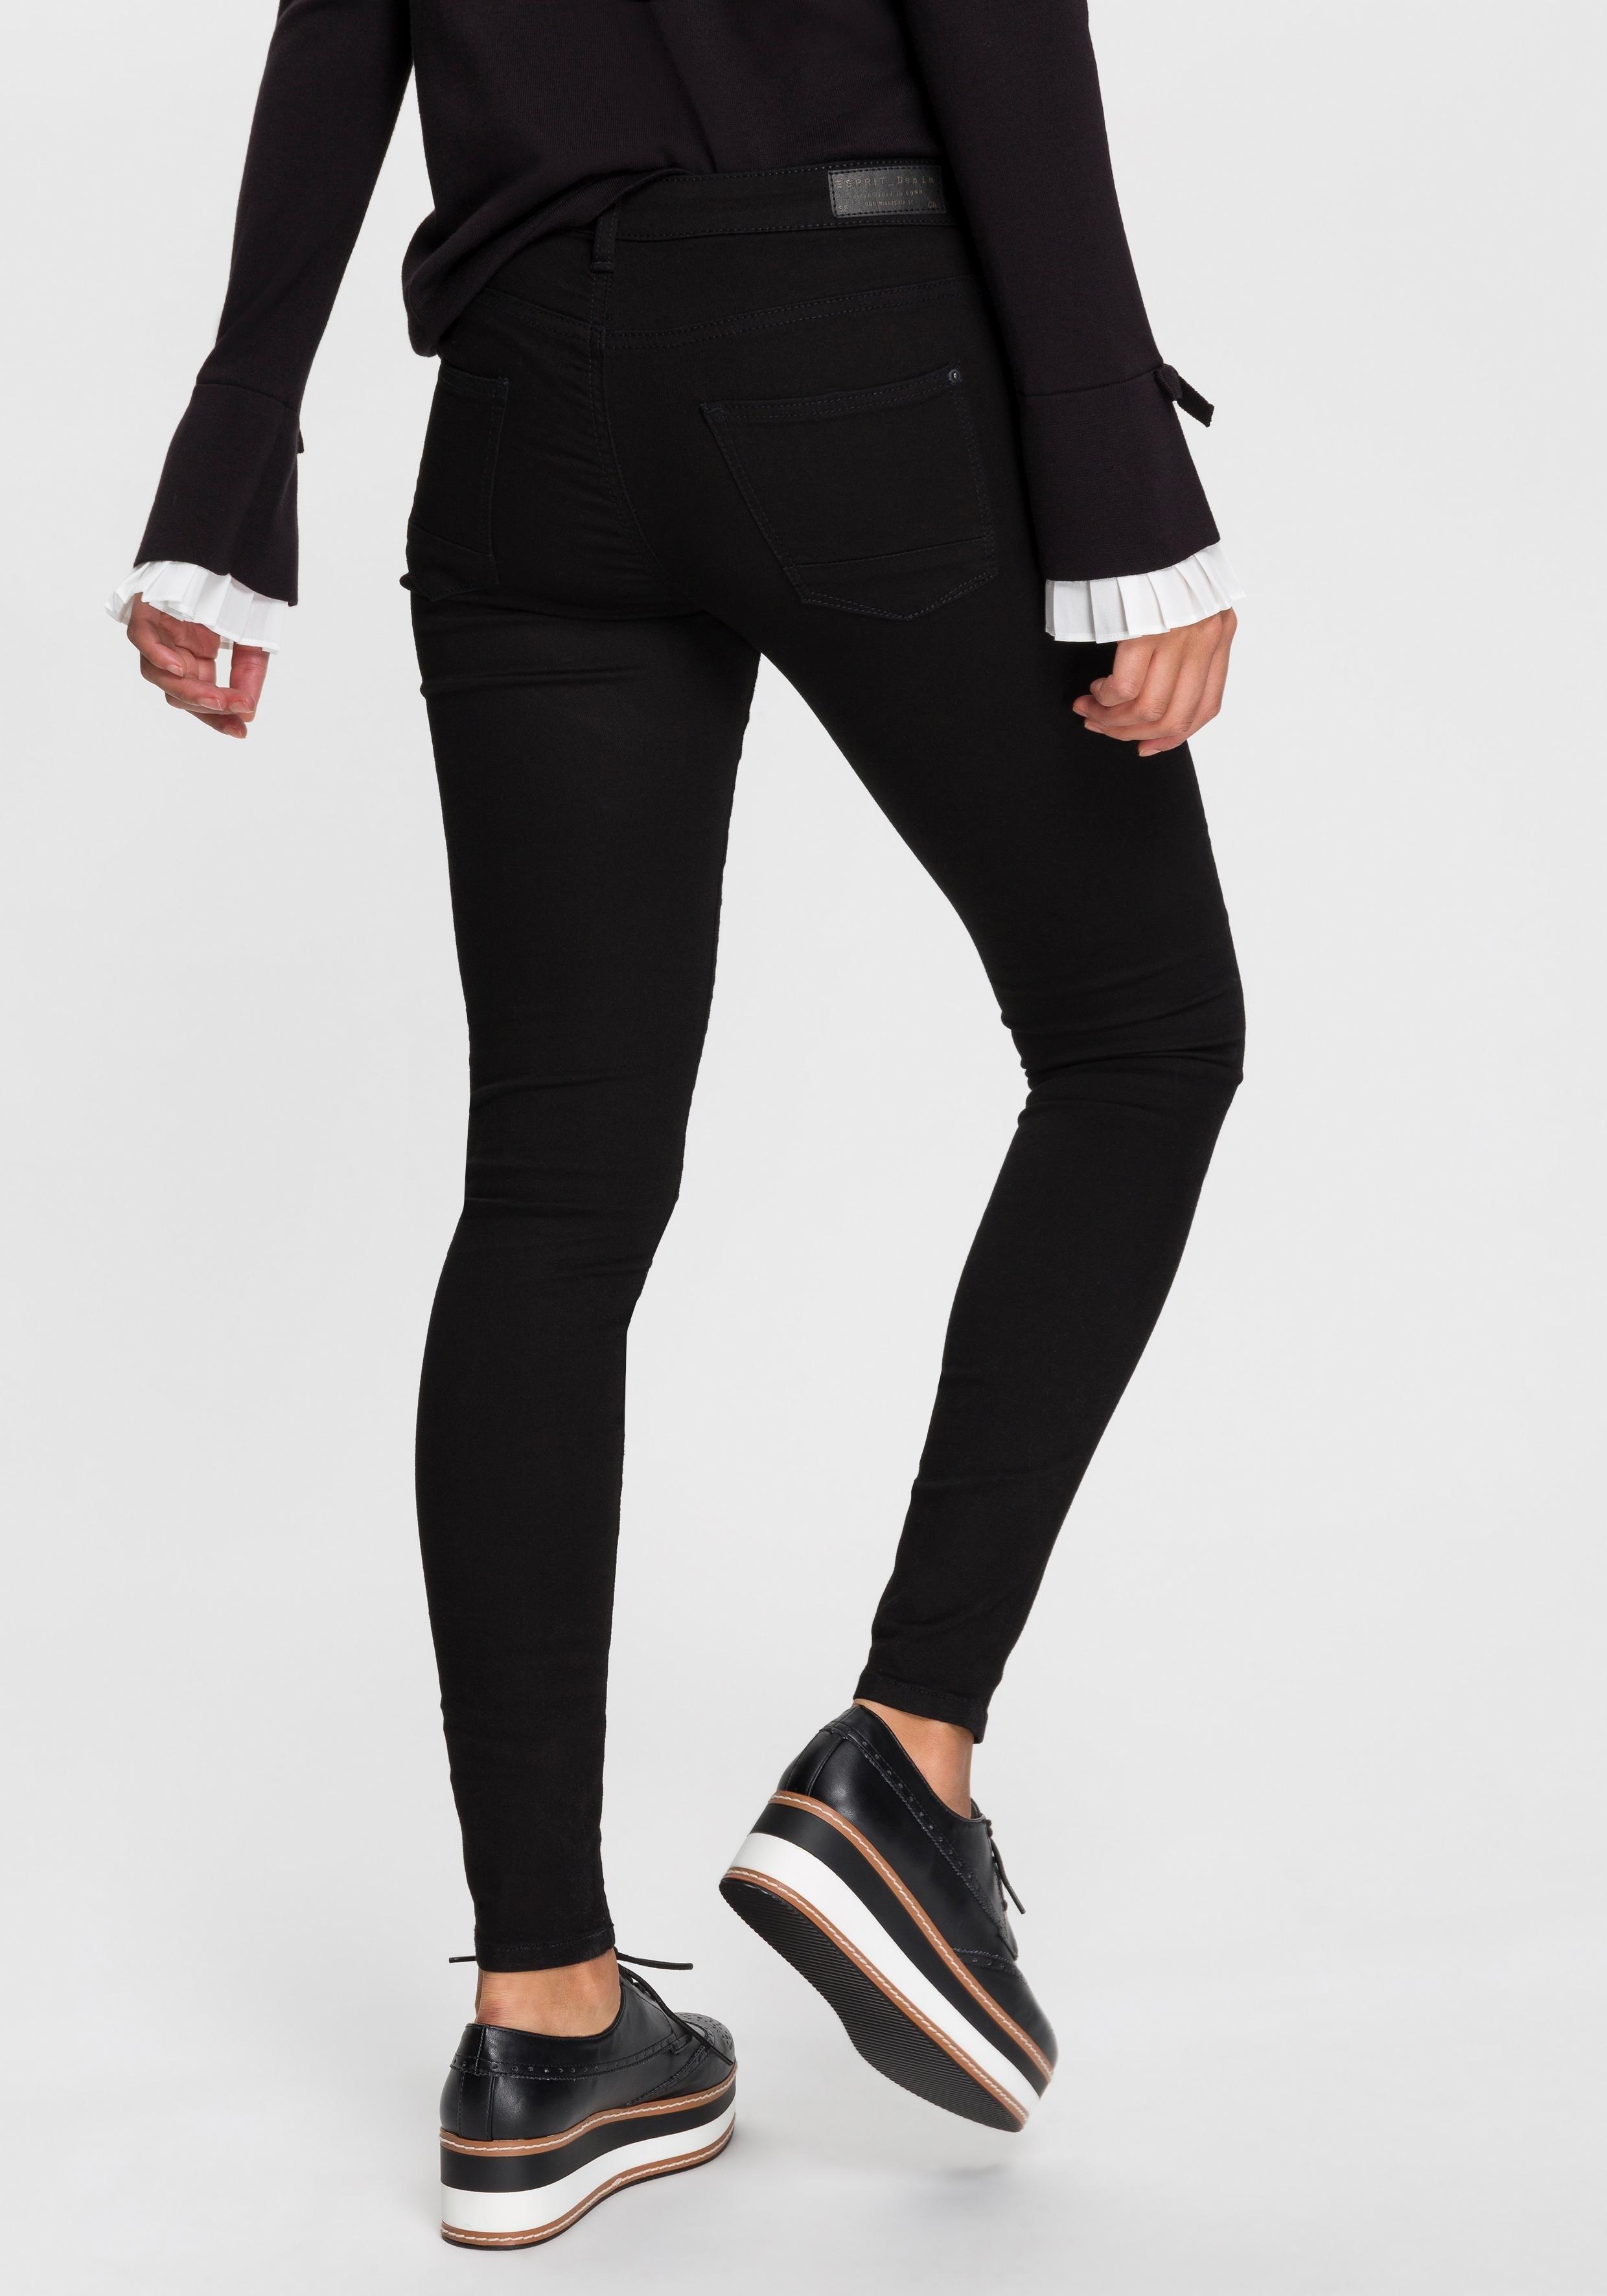 ESPRIT stretch jeans nu online kopen bij OTTO